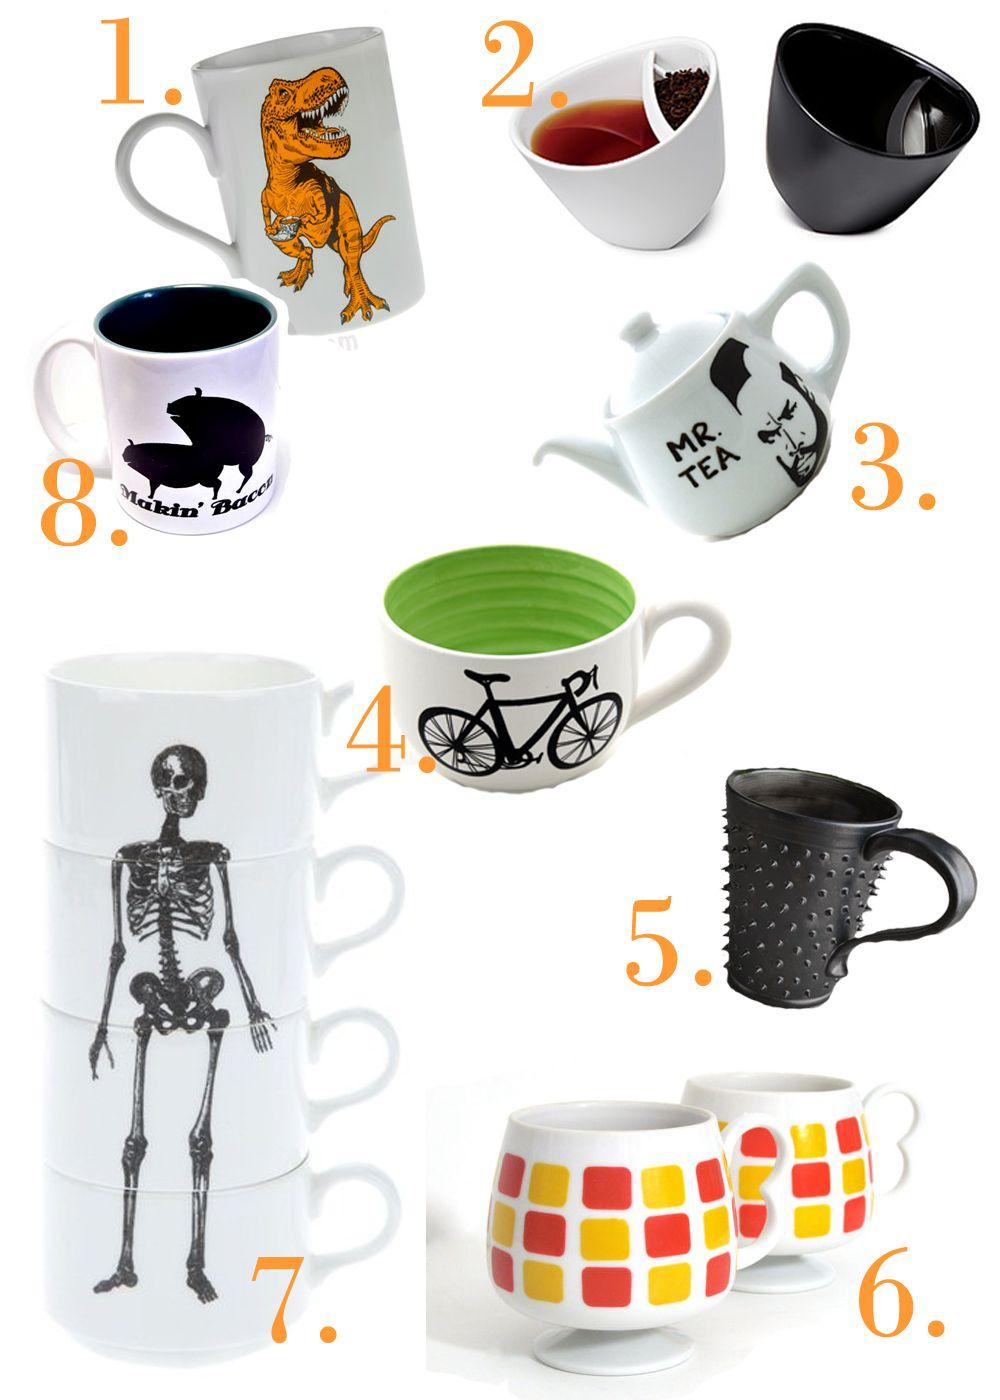 Coffee & Tea Mugs - and a Mr. T Teapot!